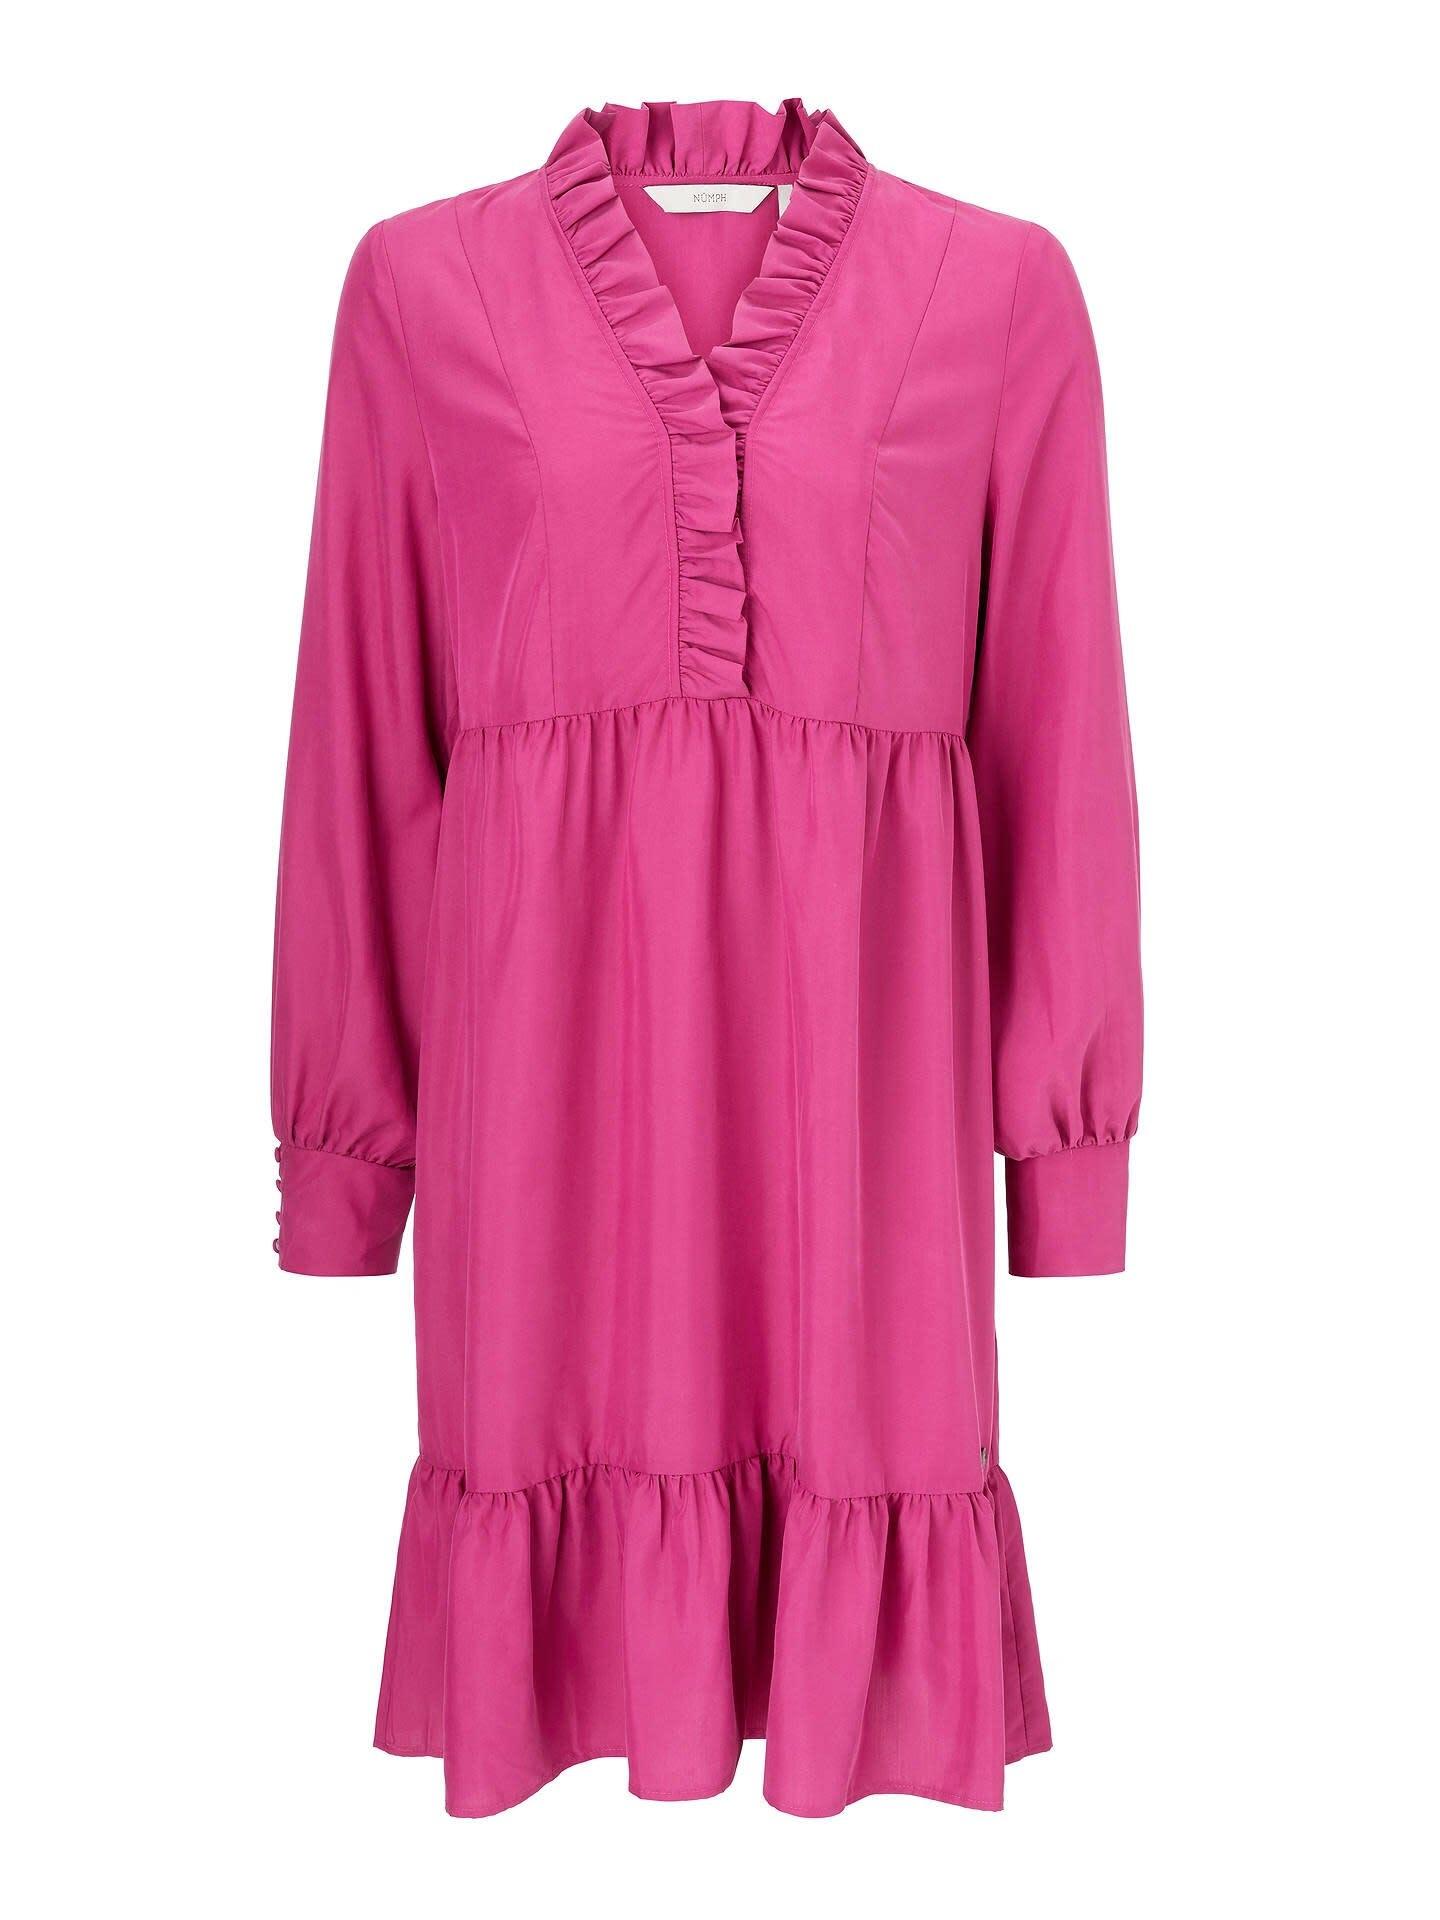 Nümph Harmonie Dress